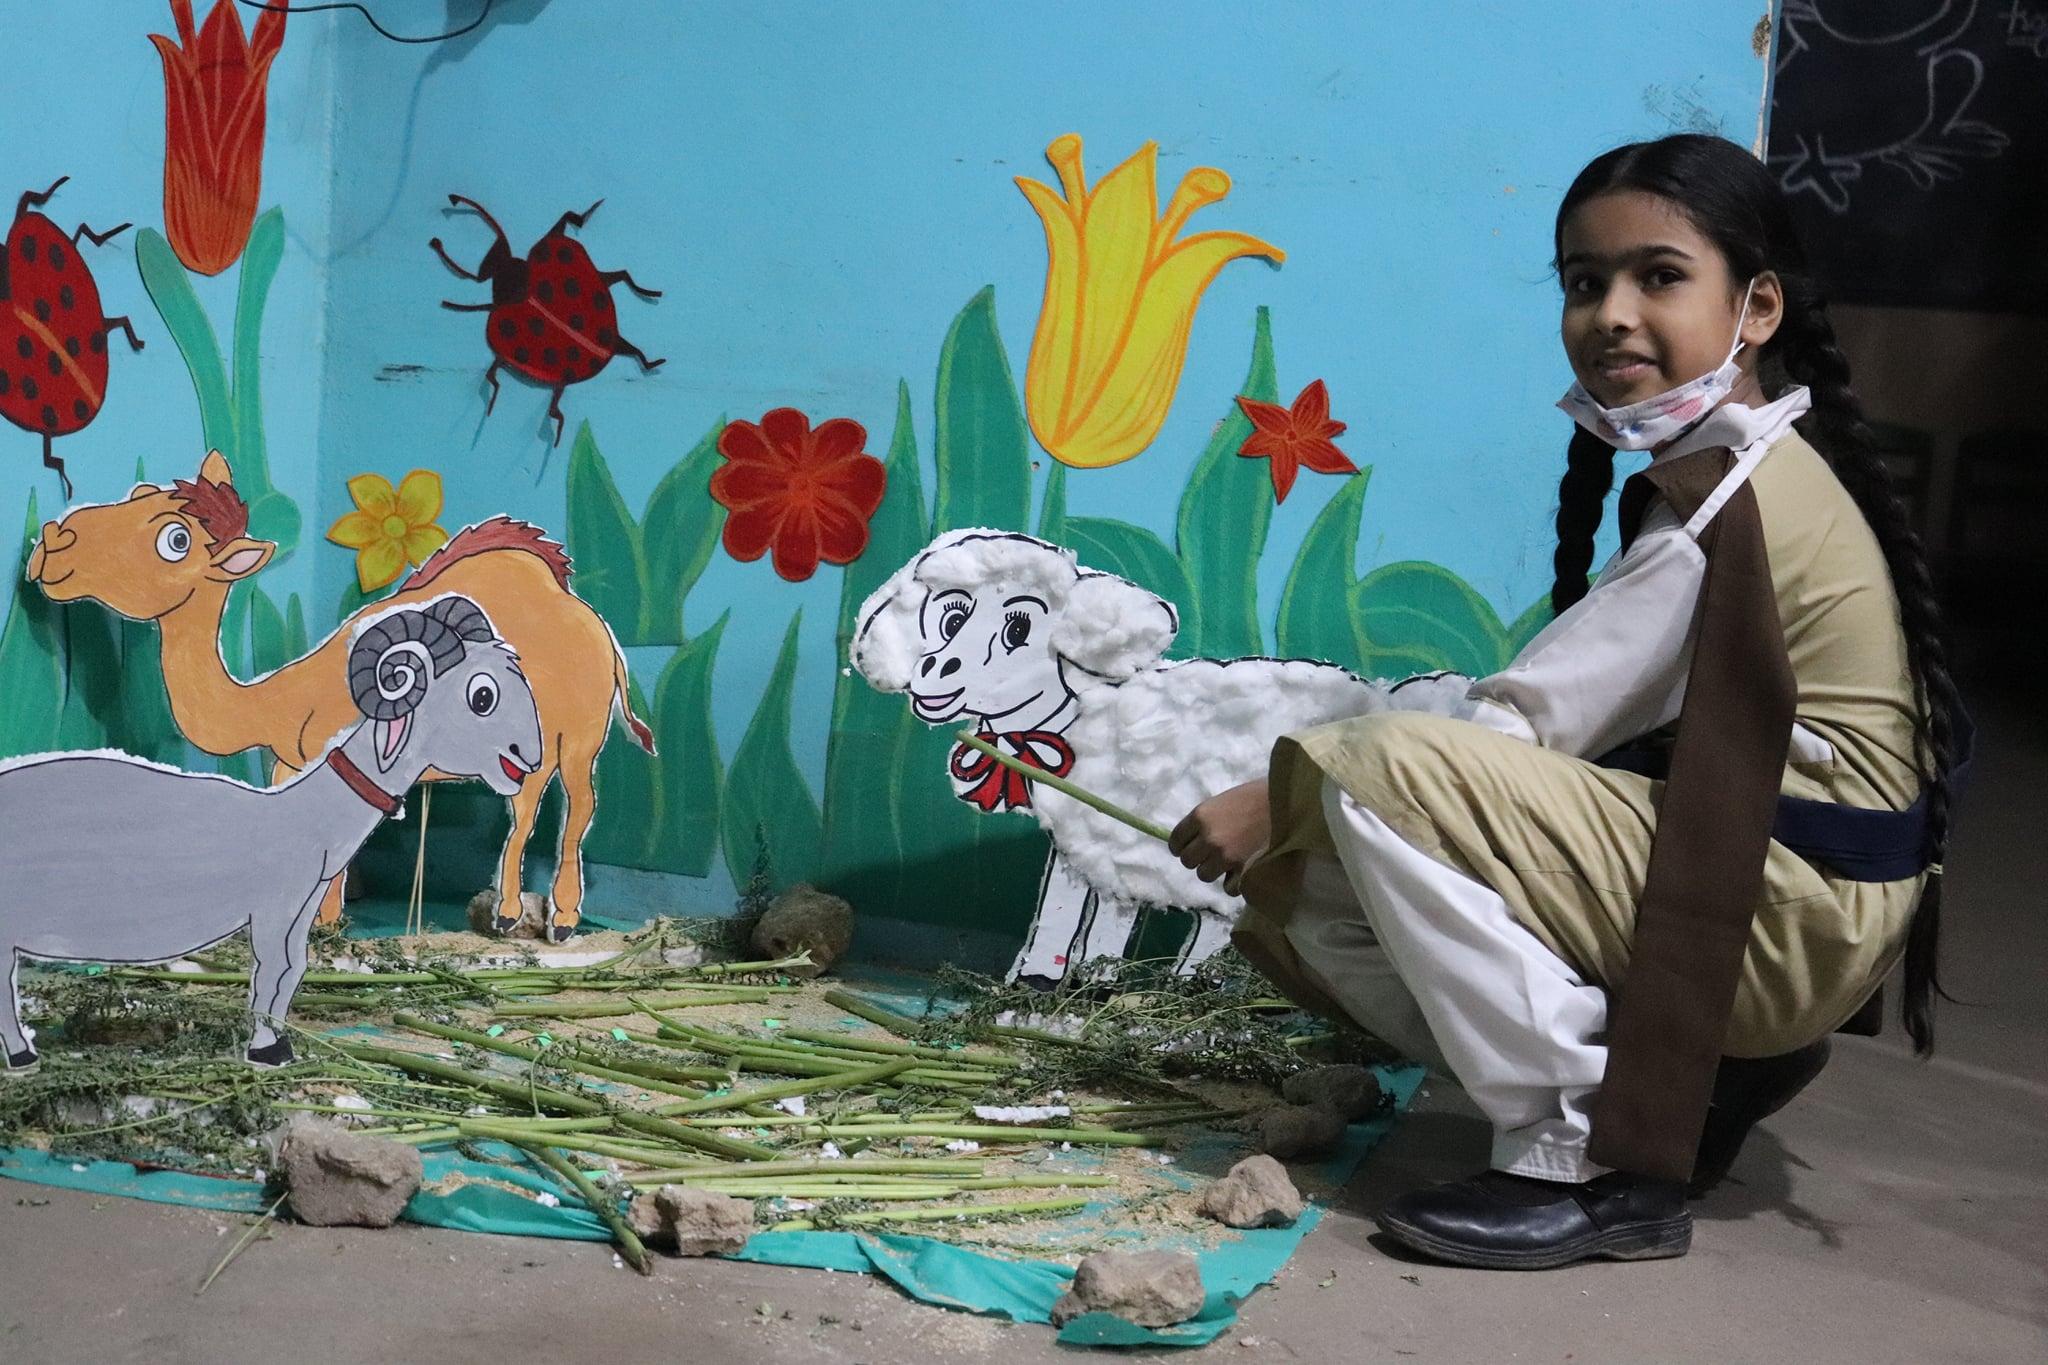 Rose Educational Society Arranged an Eid ul Azha Activity in Red Rose Grammar School Khadda.